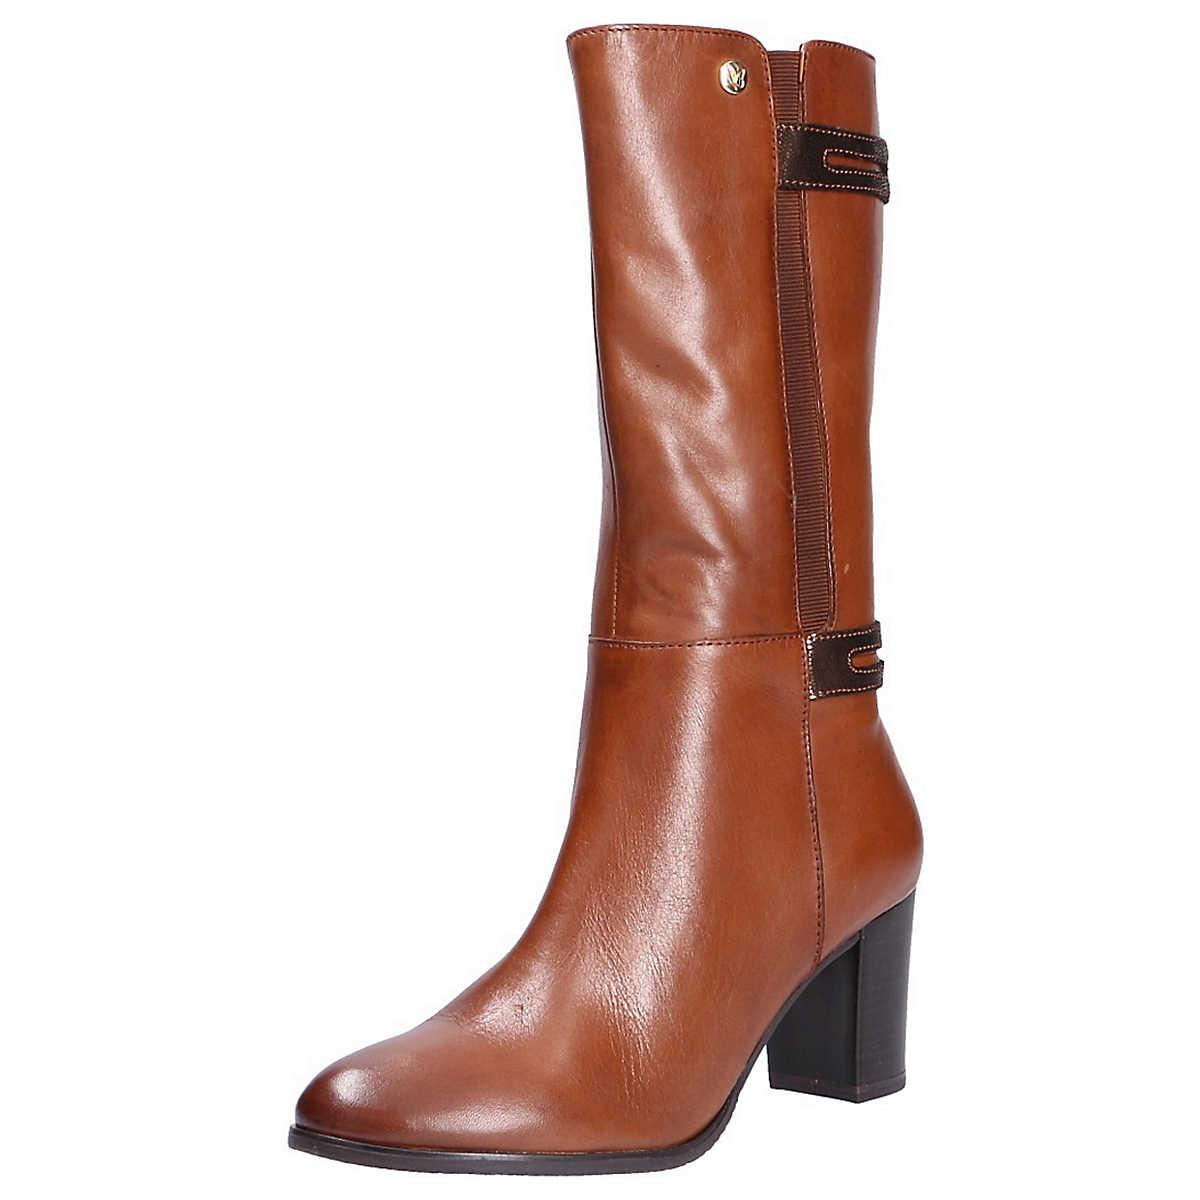 CAPRICE Stiefel braun - CAPRICE - Stiefel - Schuhe - mirapodo.de